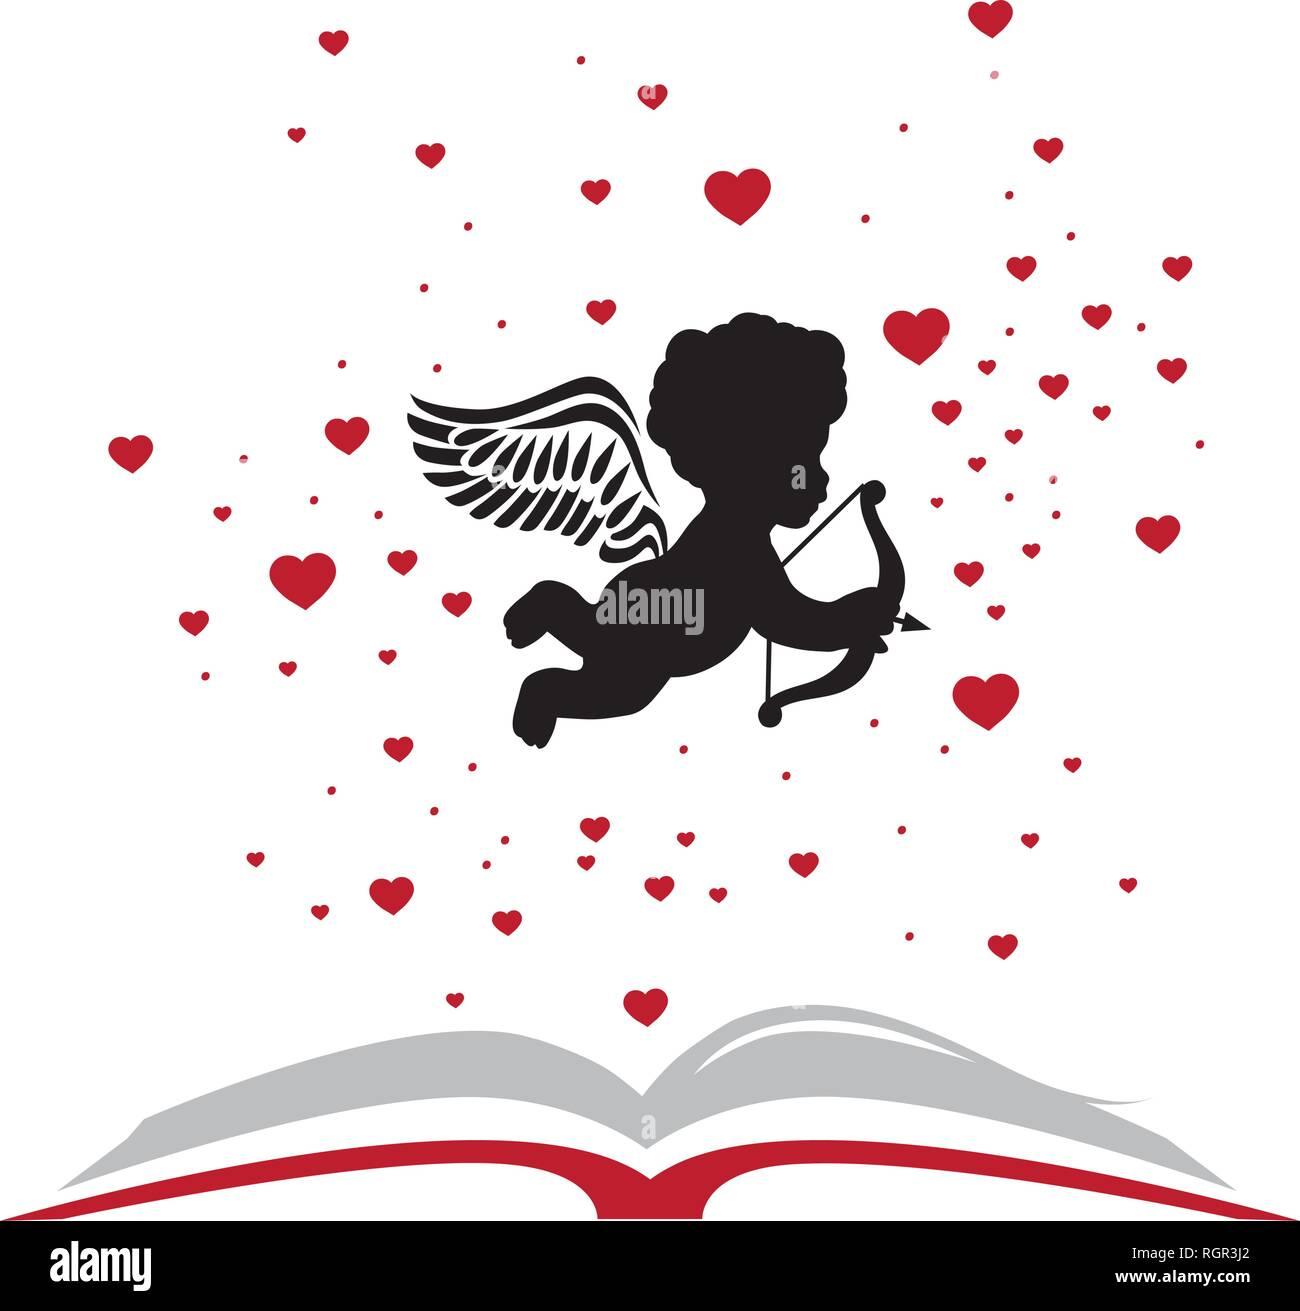 cupid book, logo icon - Stock Image